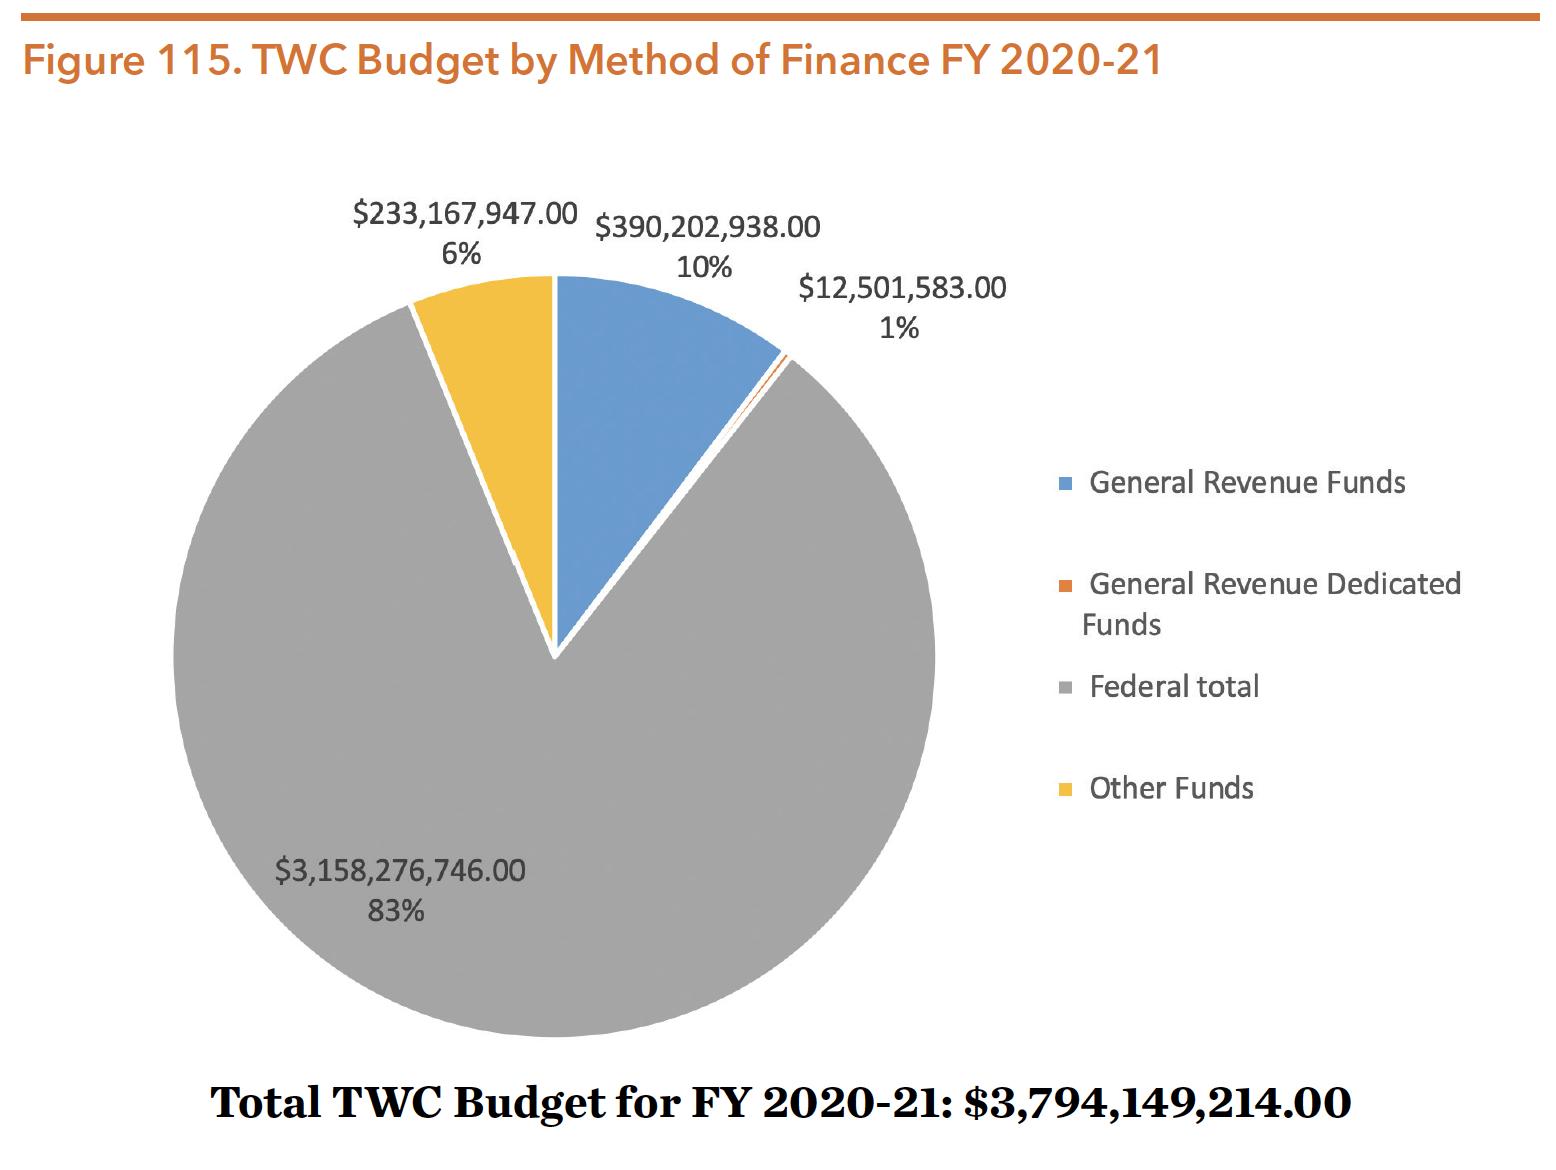 Figure 115. TWC Budget by Method of Finance FY 2020-21